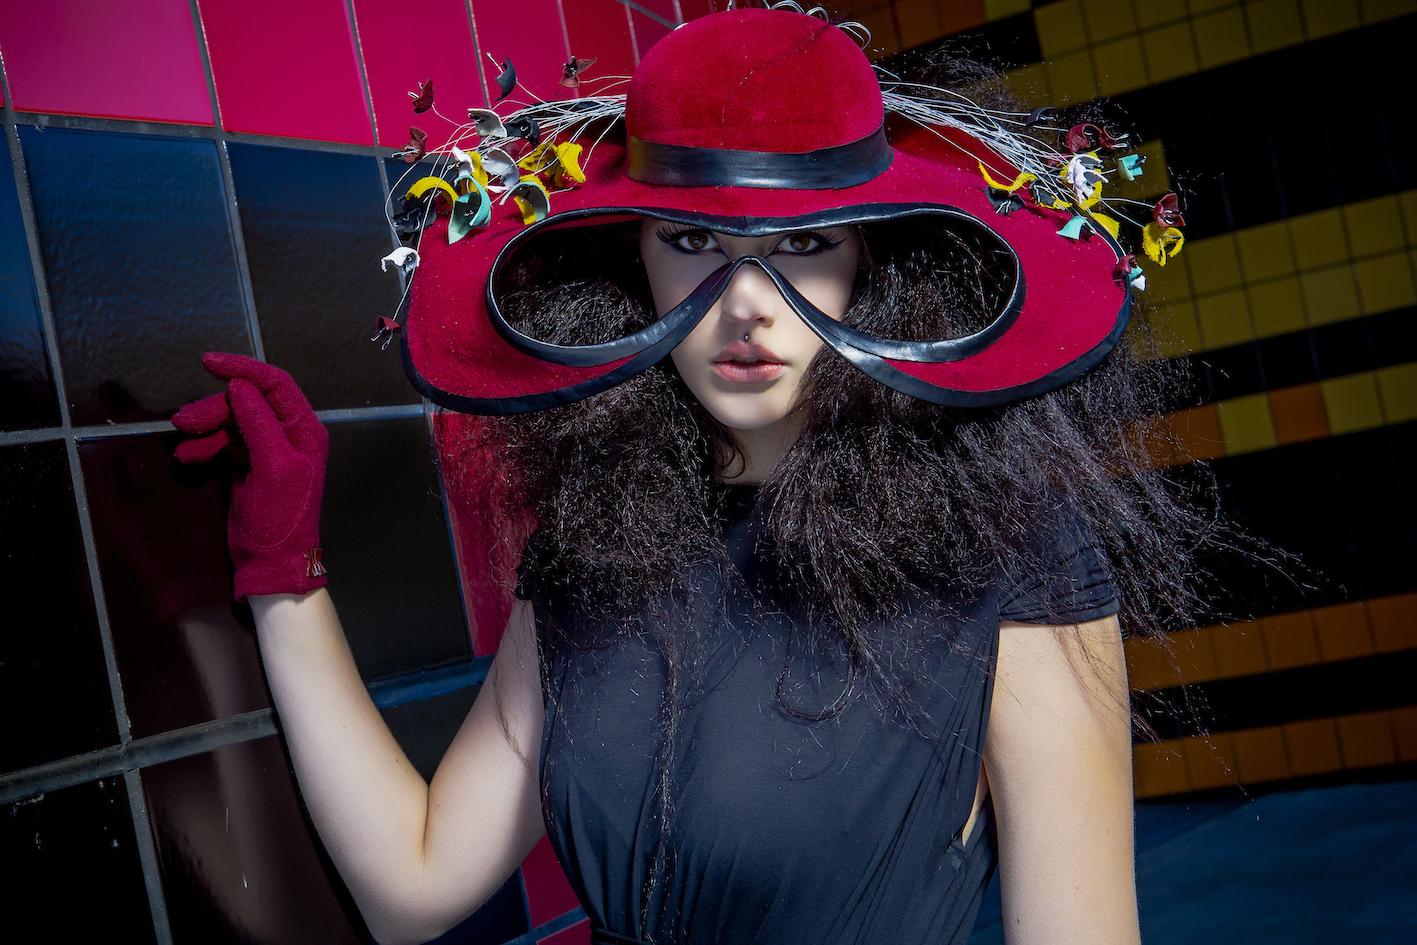 Sovata X Libris. Photographer: Eric Piris, RED Photography. Hair Artist: Designer, Jade Sargent. Makeup Artists: Belle Artistry, Gabbi Vannithone